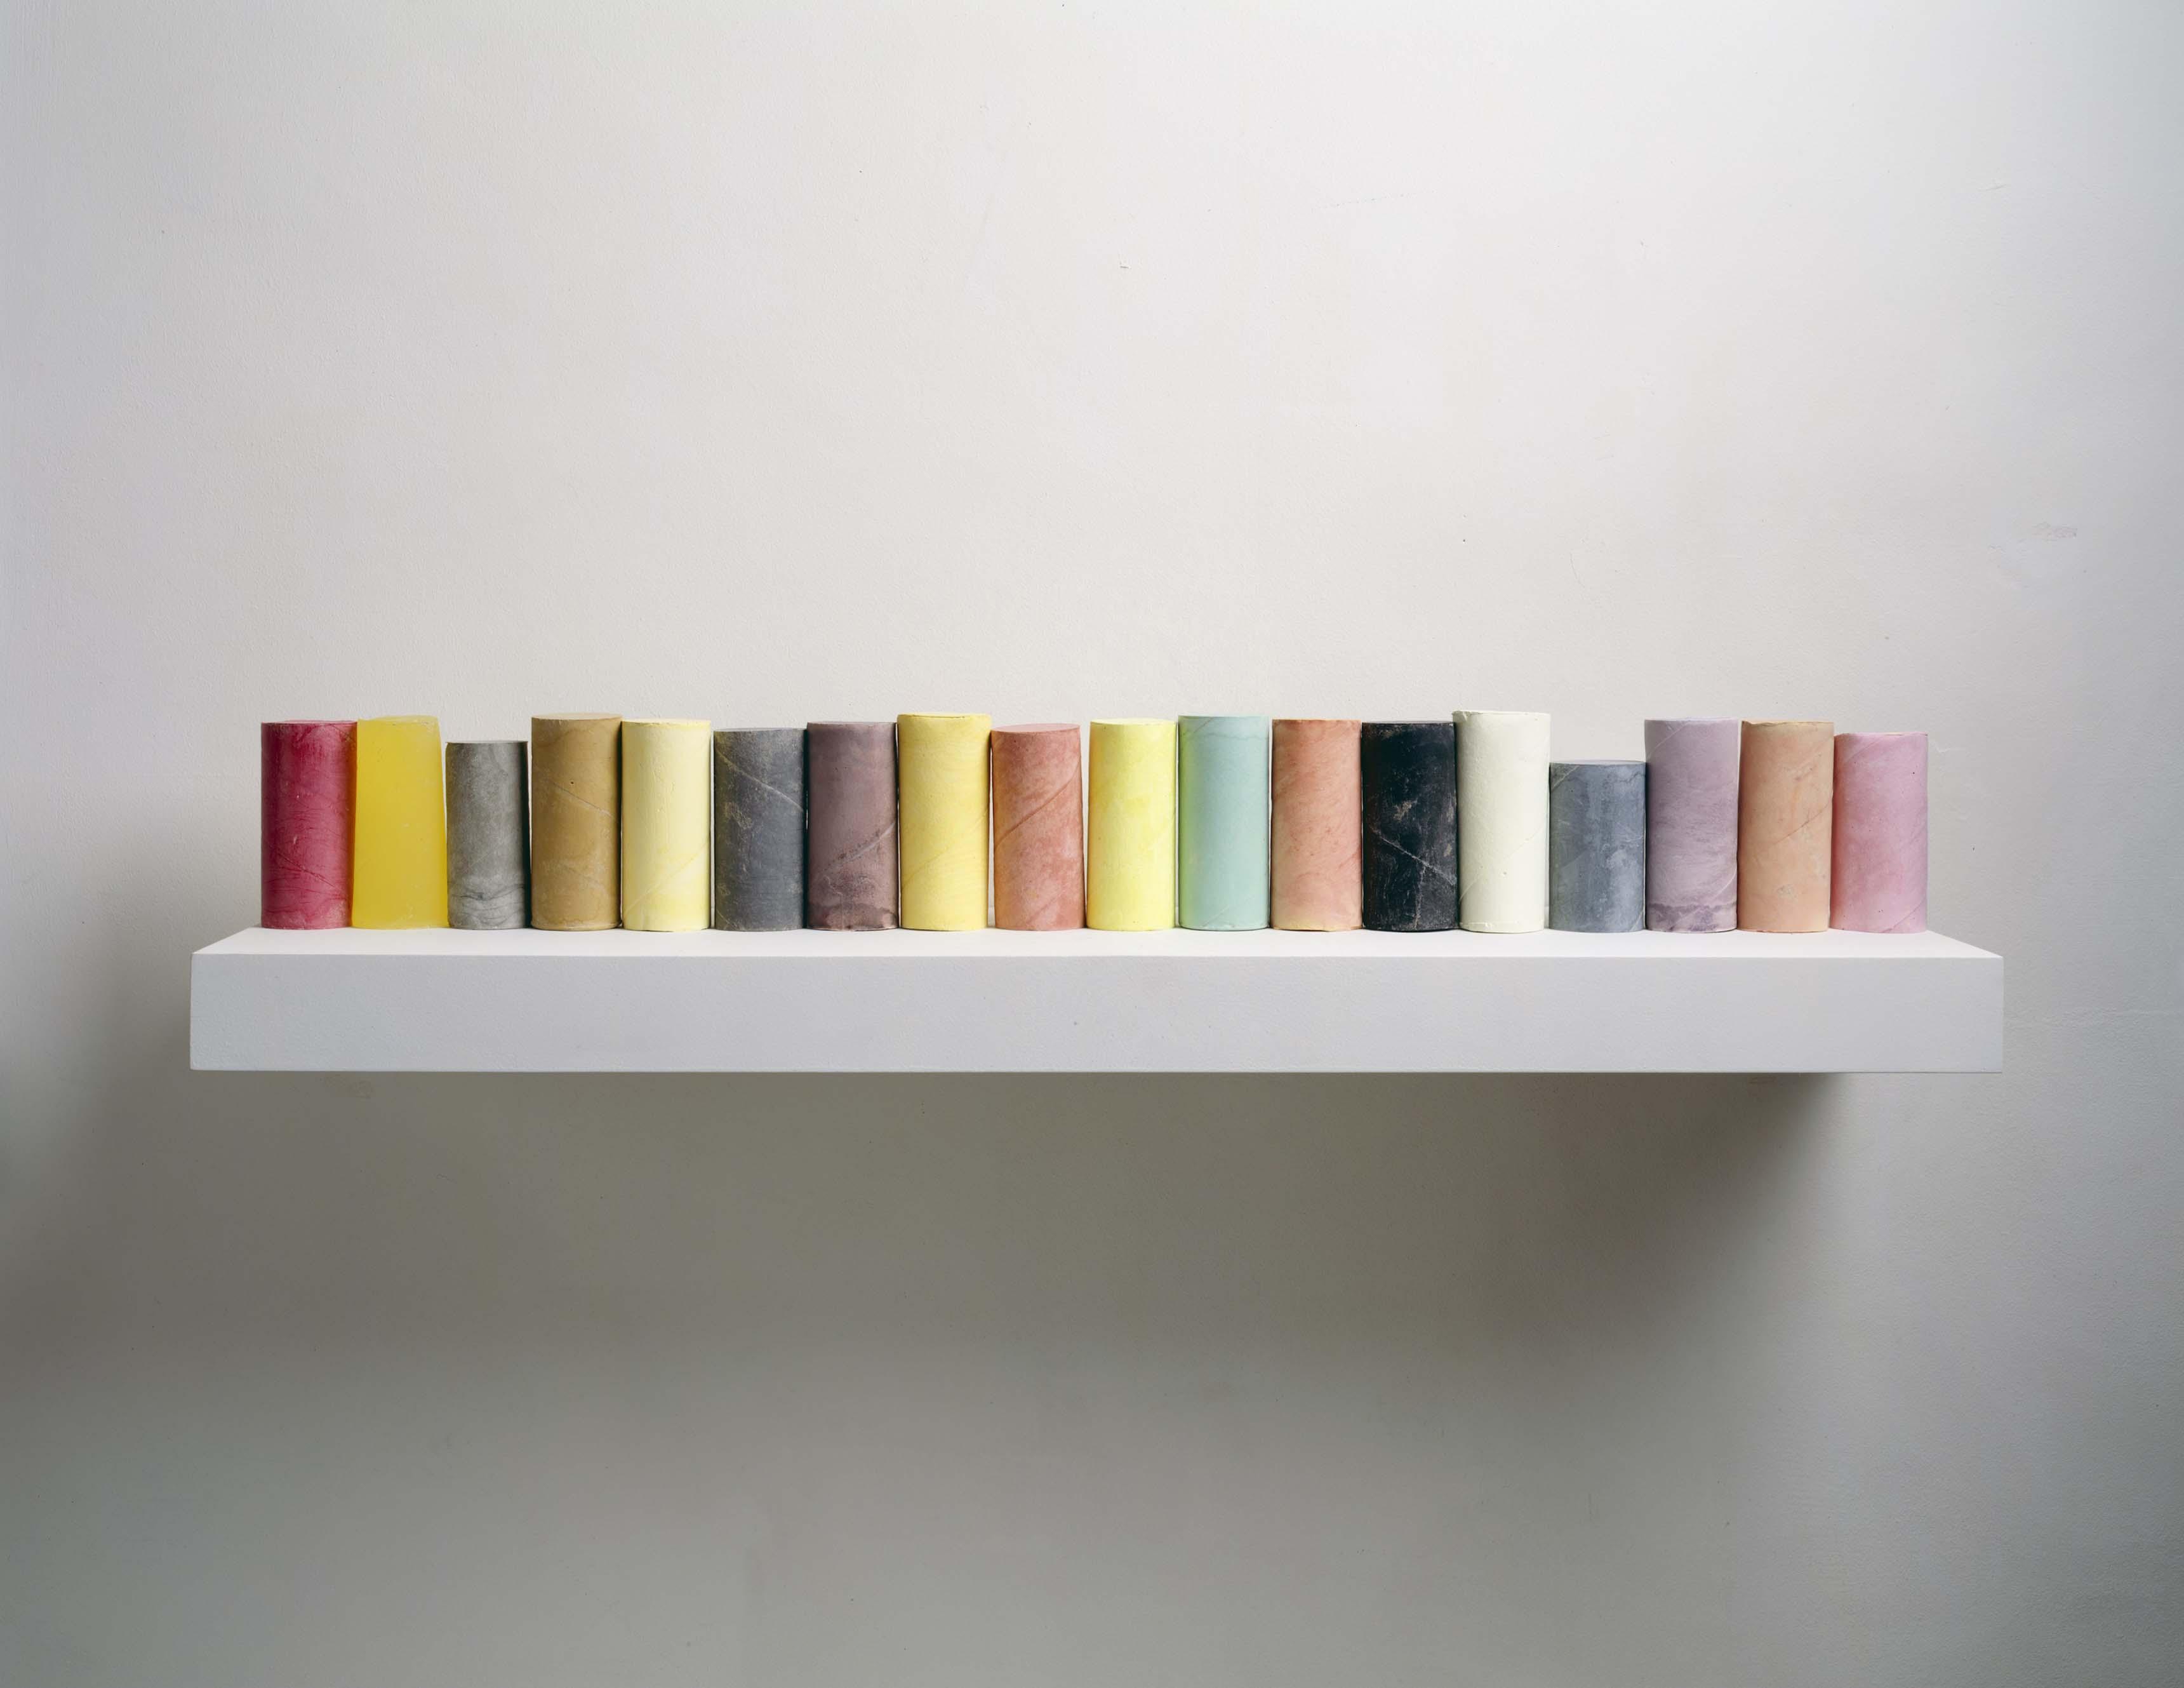 Line-up, 2007, Rachel Whiteread